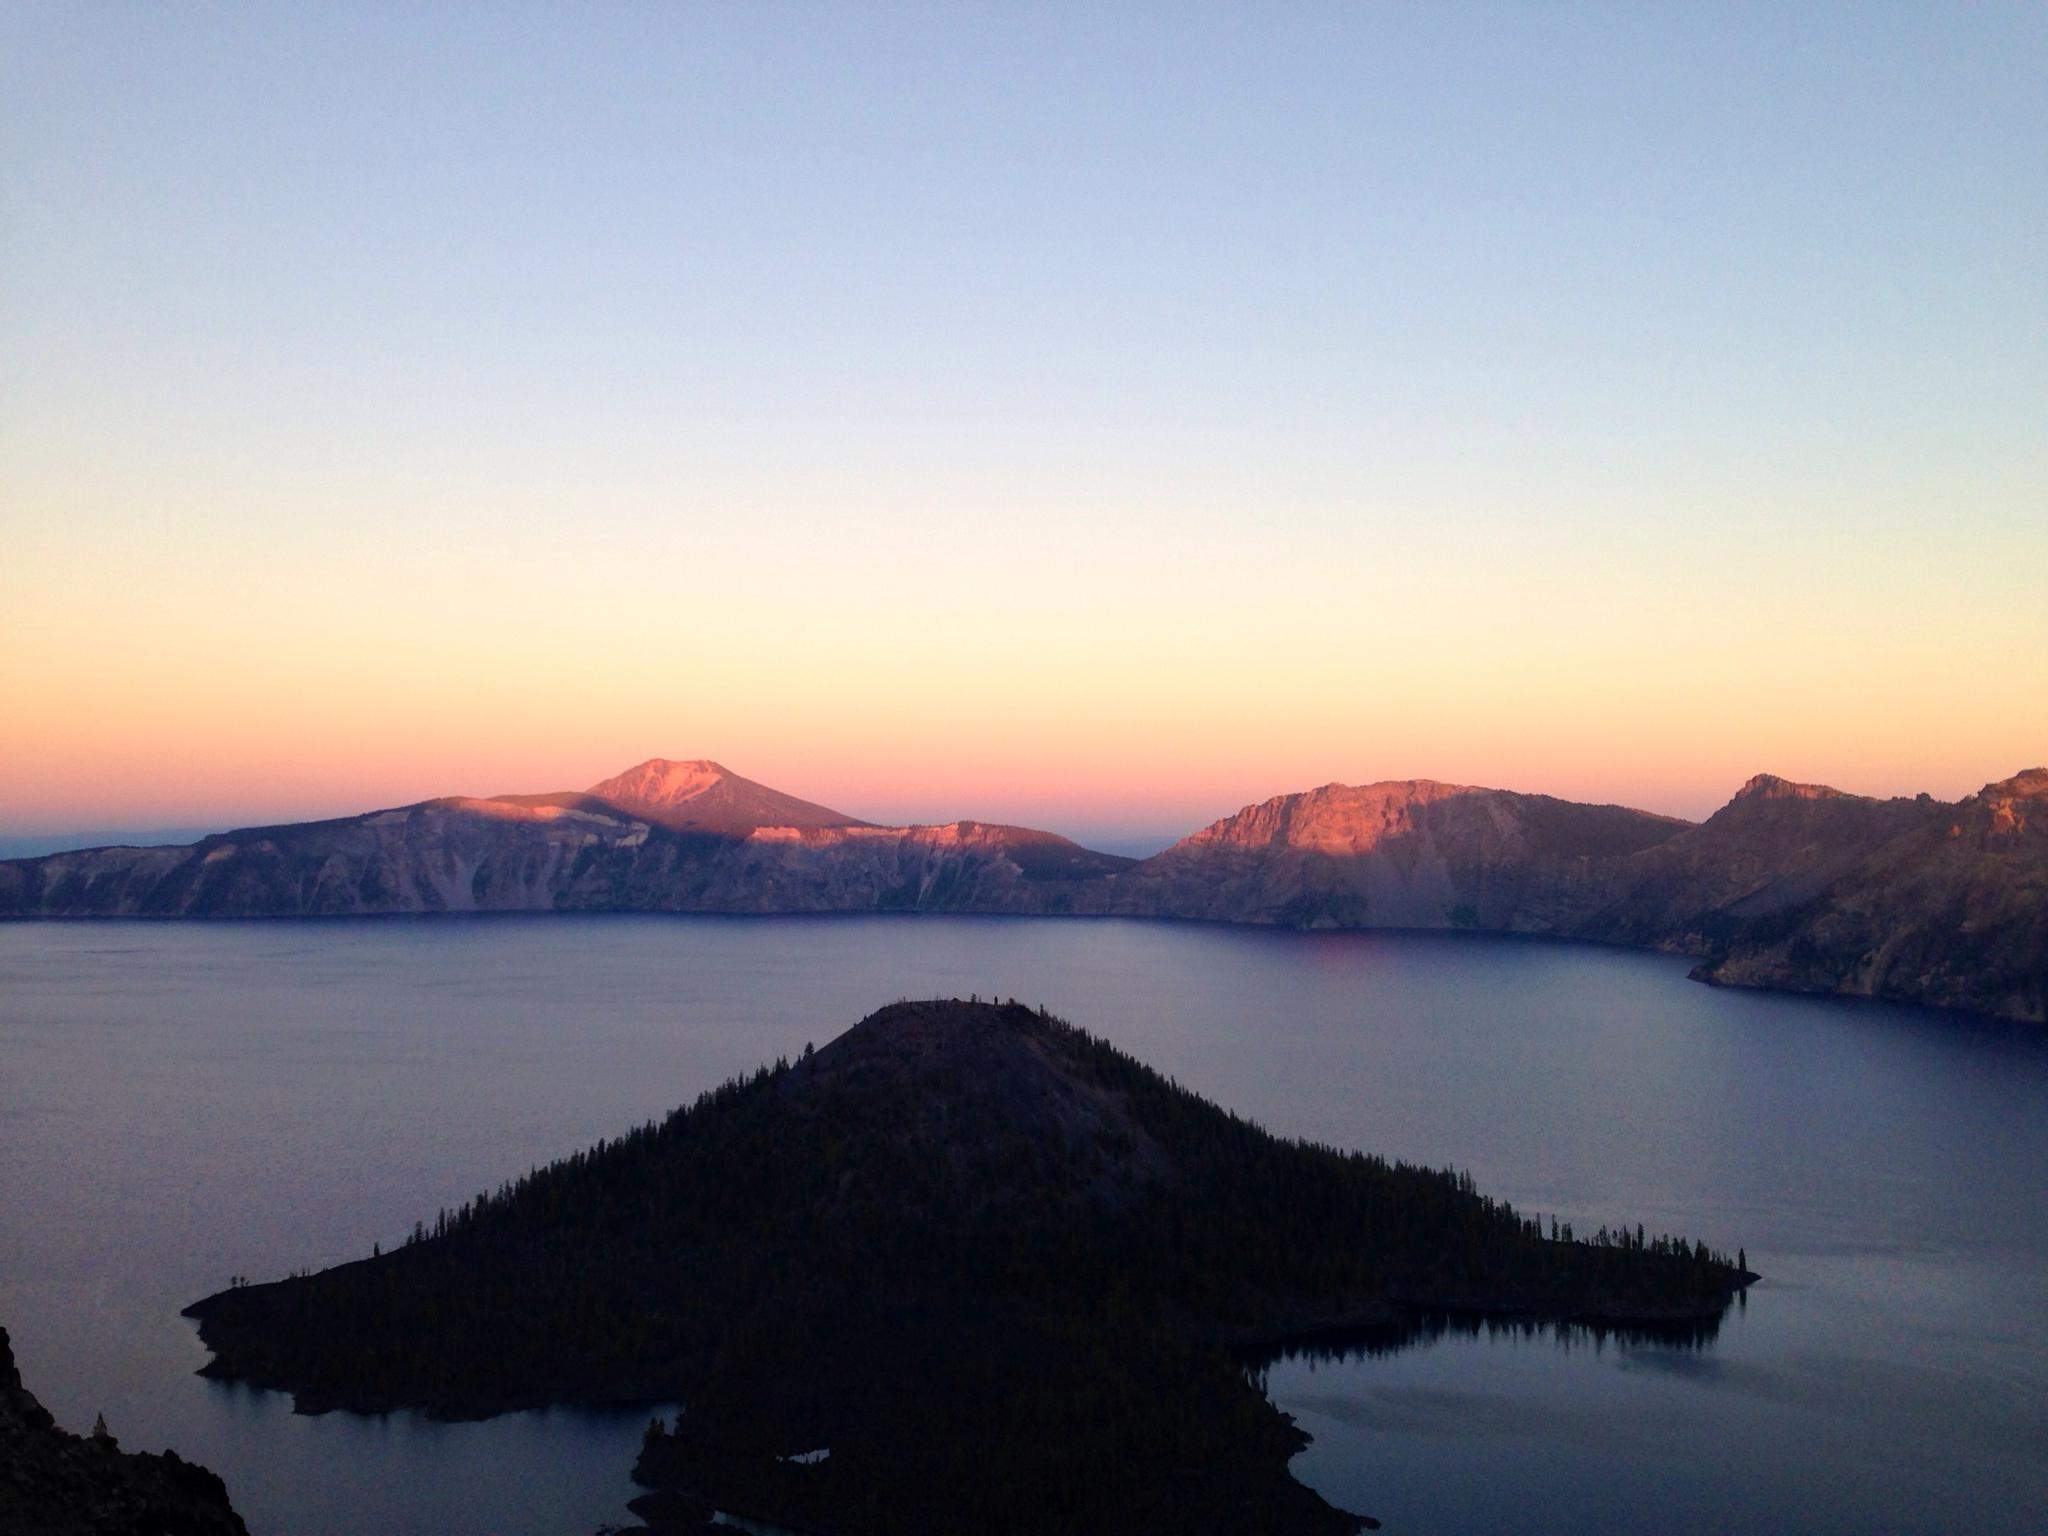 Sunset at Crater Lake  by RockyTopSkiBum